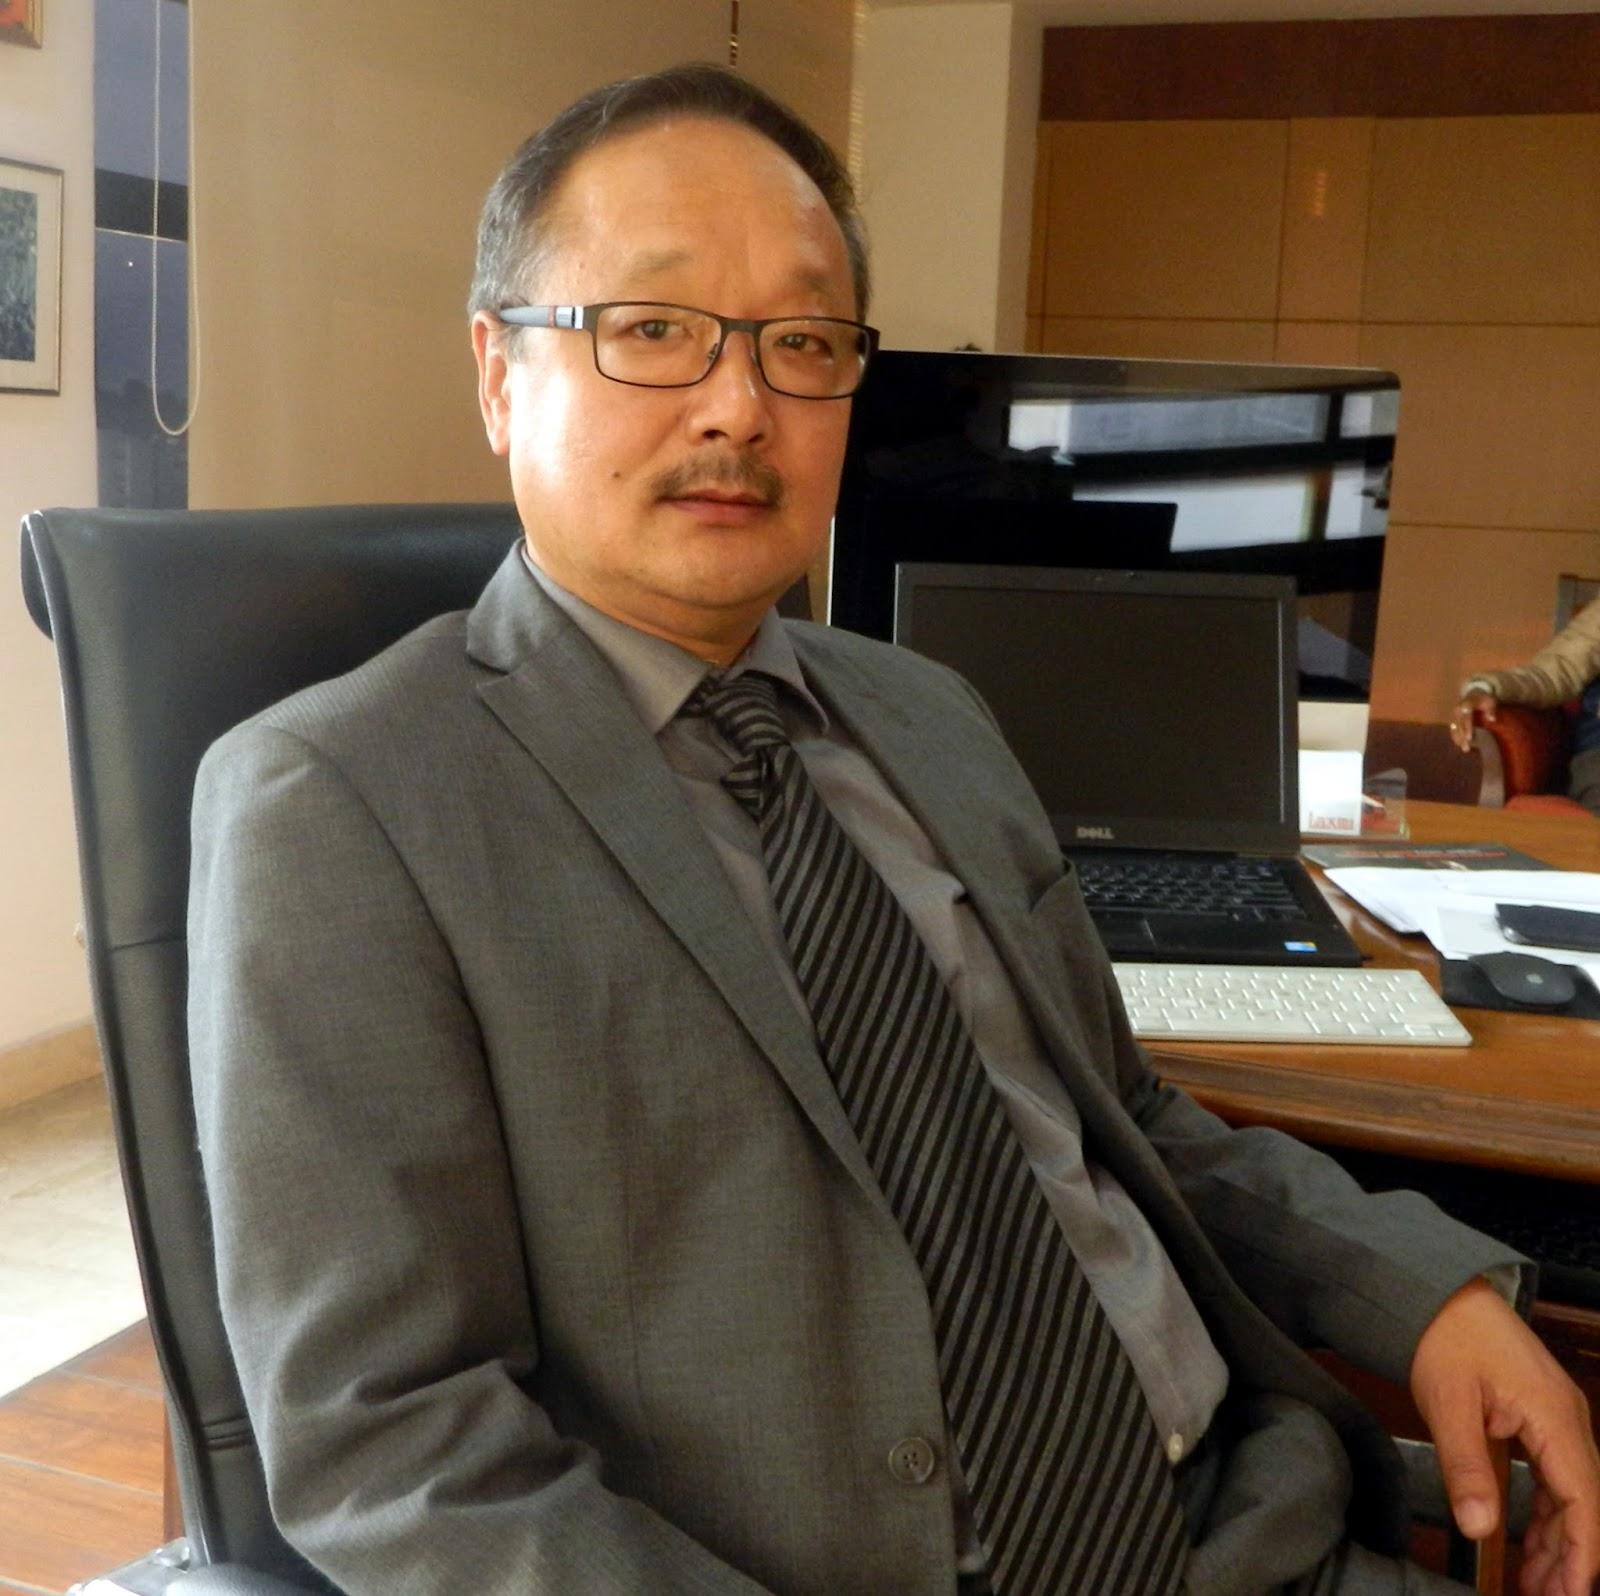 एभरेष्ट बैंकमा पहिलो पटक नेपाली प्रमुख कार्यकारी अधिकृत